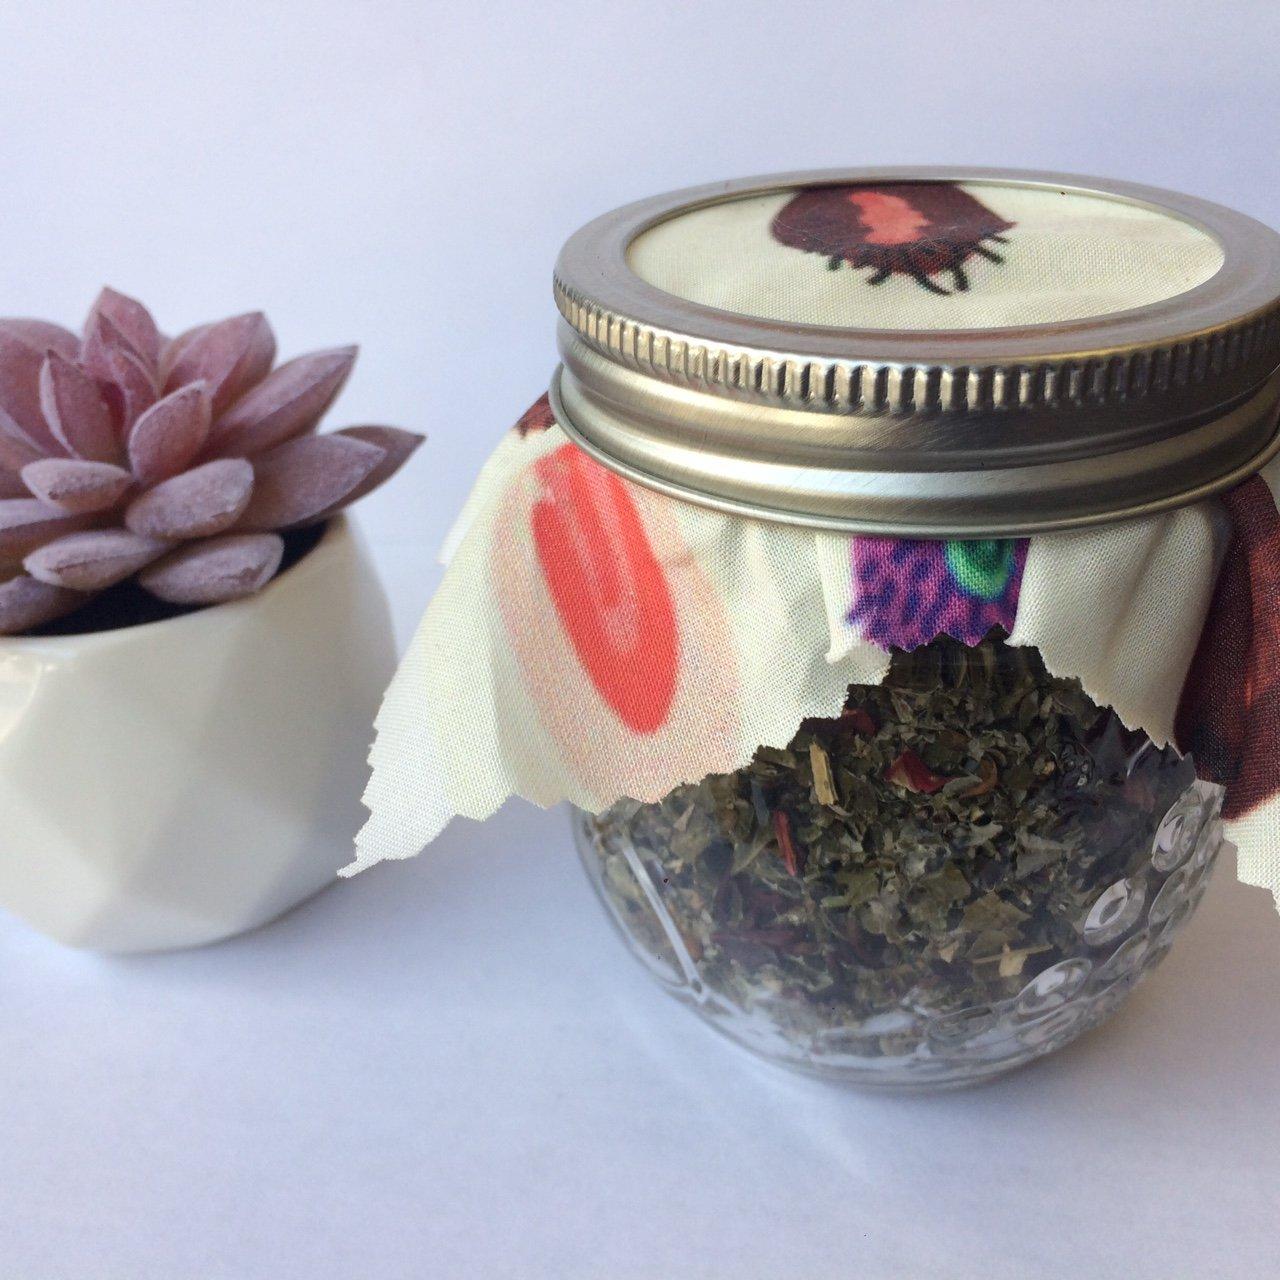 Womb Care Tea Blend